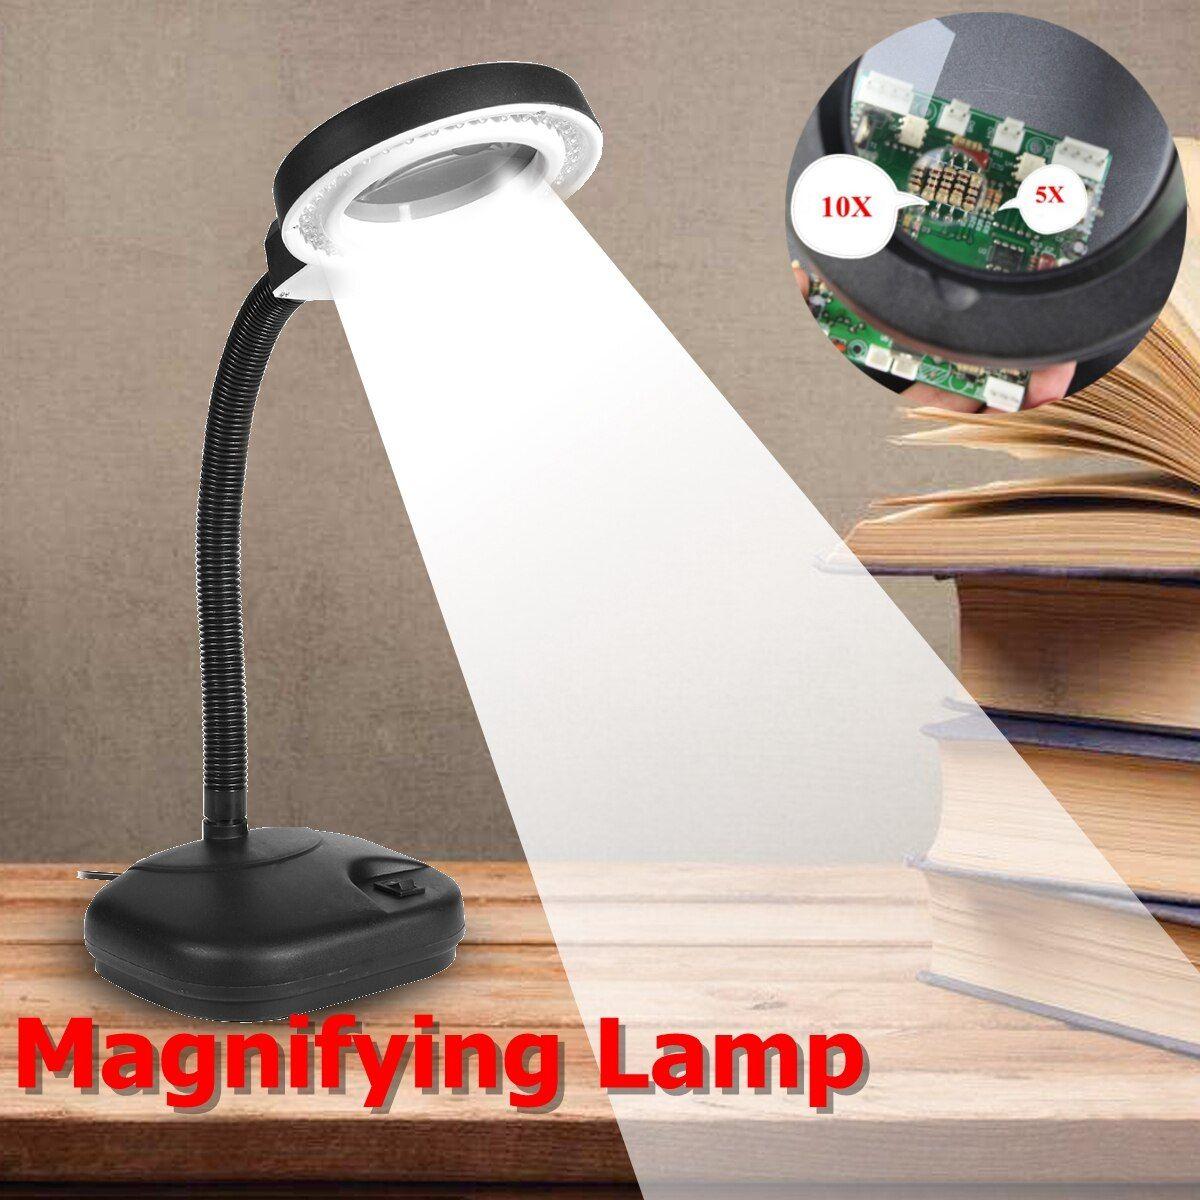 Zeast 5x 10x Magnifier Led Desk Light Daylight Craft Glass Table Lamp 36 Led Multi Function Desktop In 2020 Magnifying Desk Lamp Led Desk Lighting Table Lamp